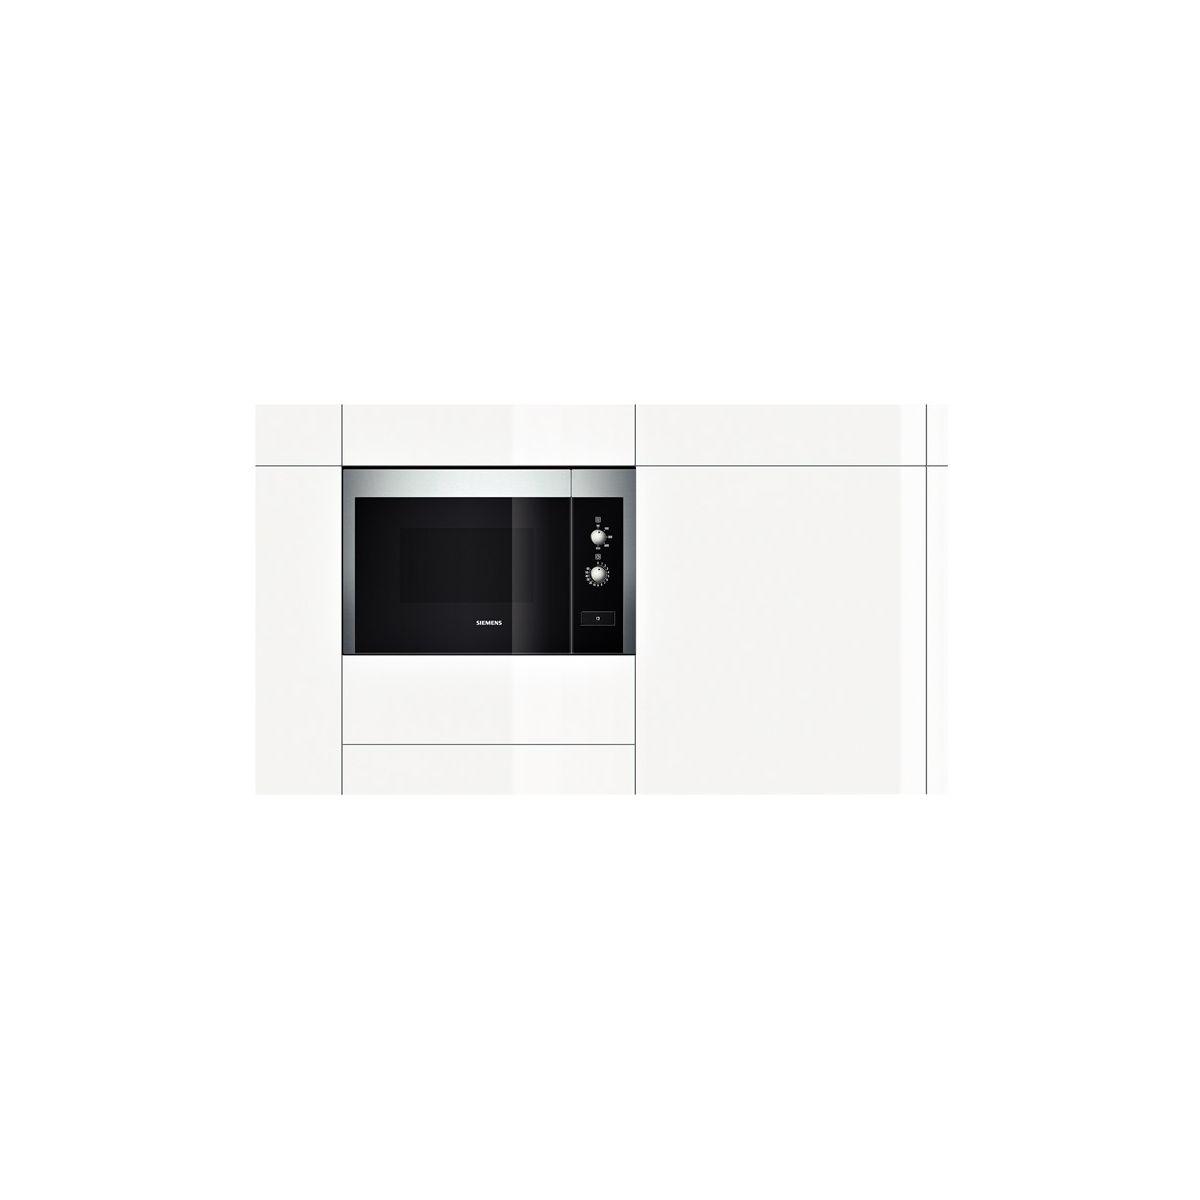 lectrom nager micro onde encastrable siemens hf22m564 10 de remise imm diate avec le code. Black Bedroom Furniture Sets. Home Design Ideas